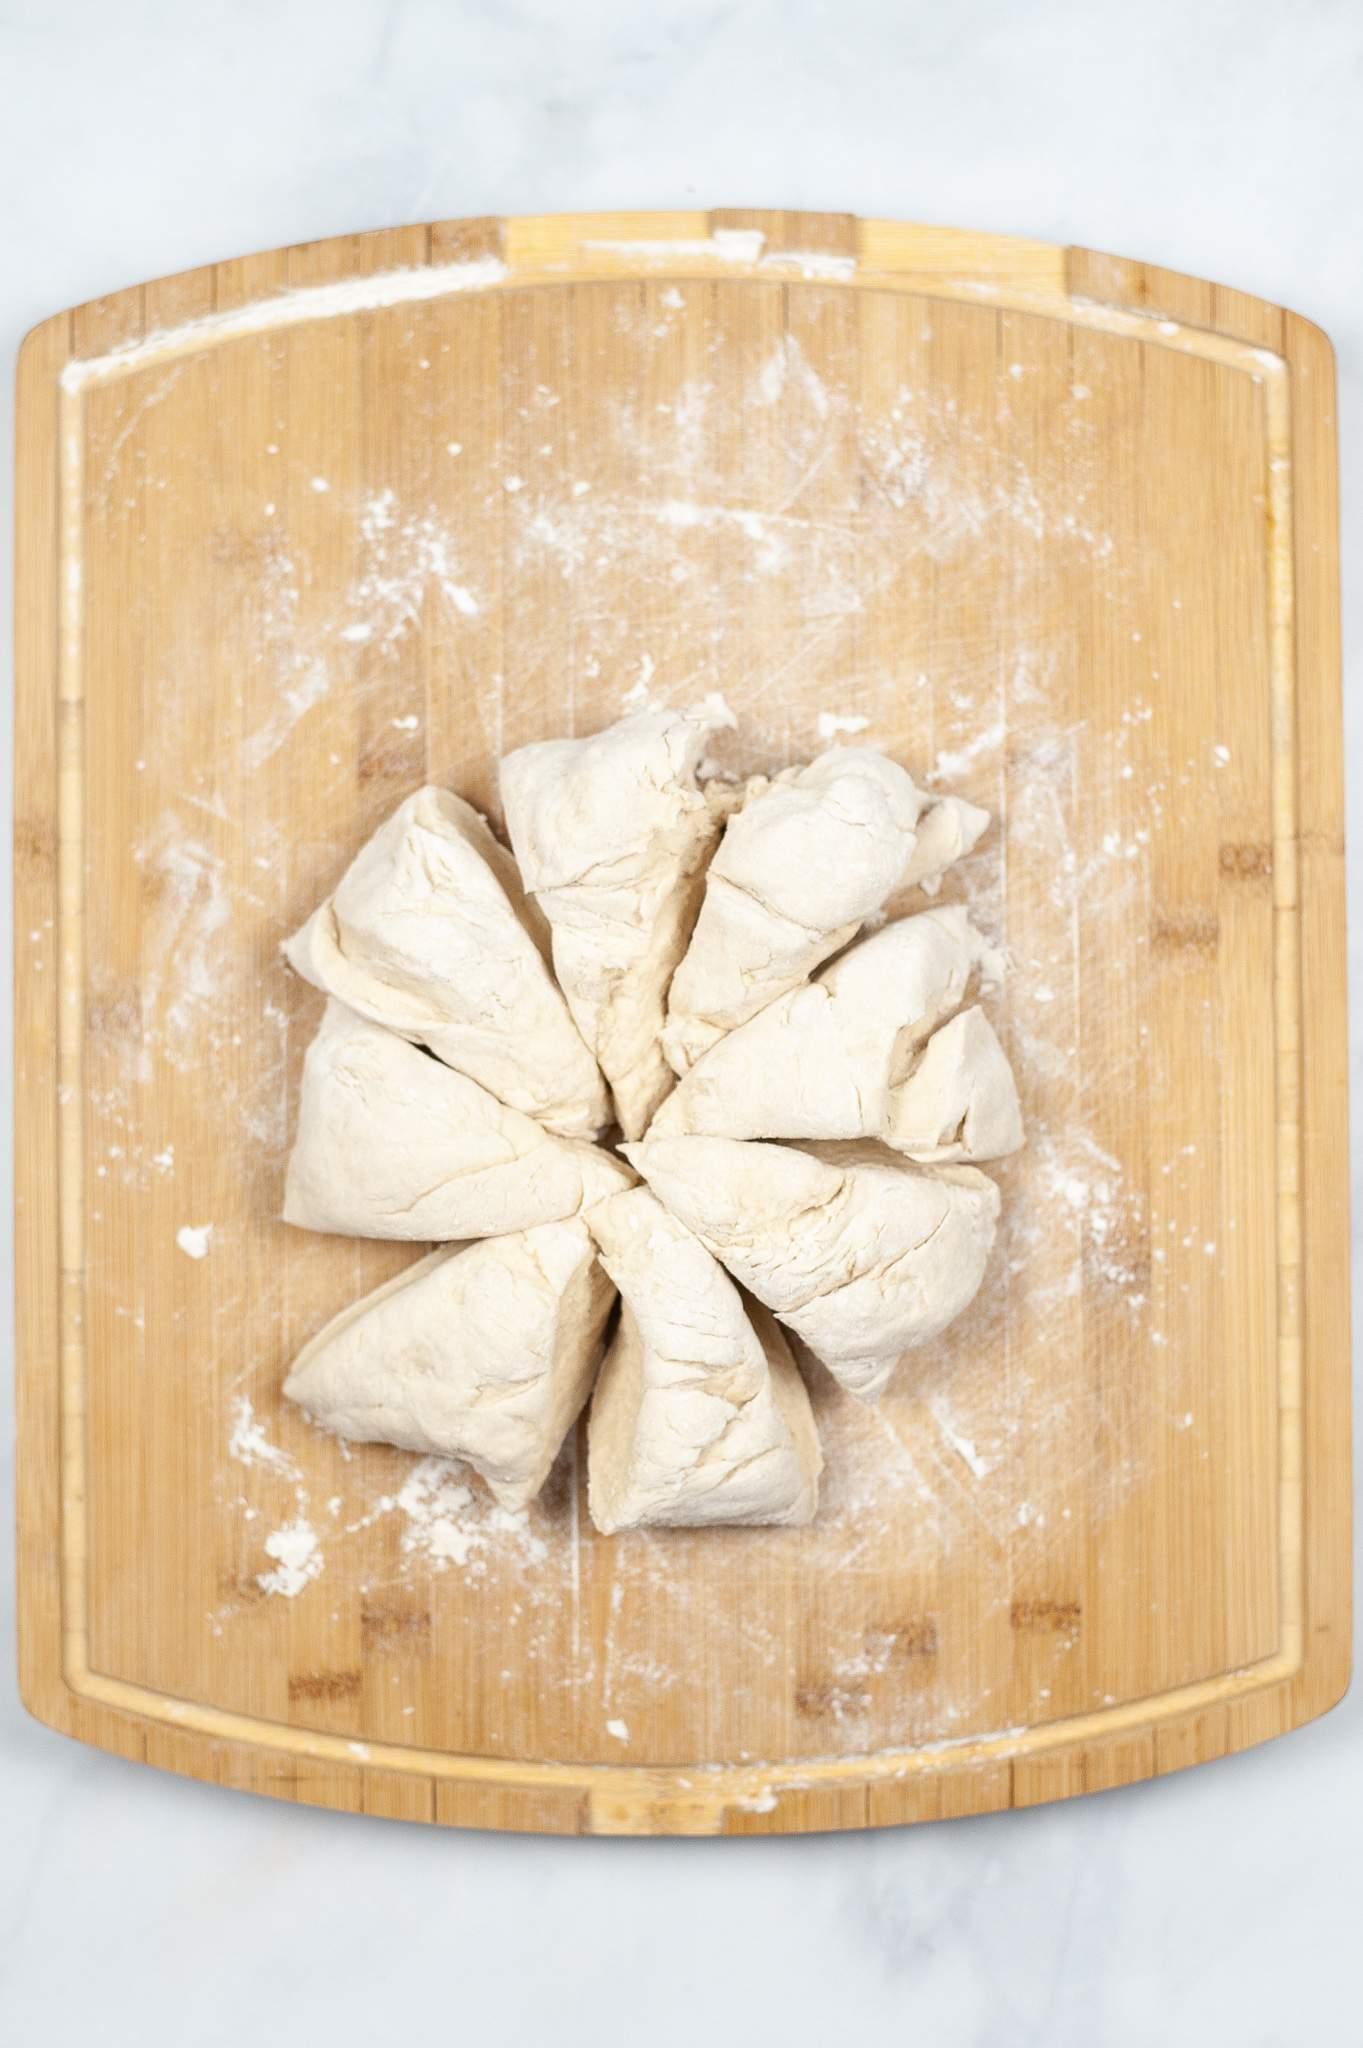 dough cut into shapes